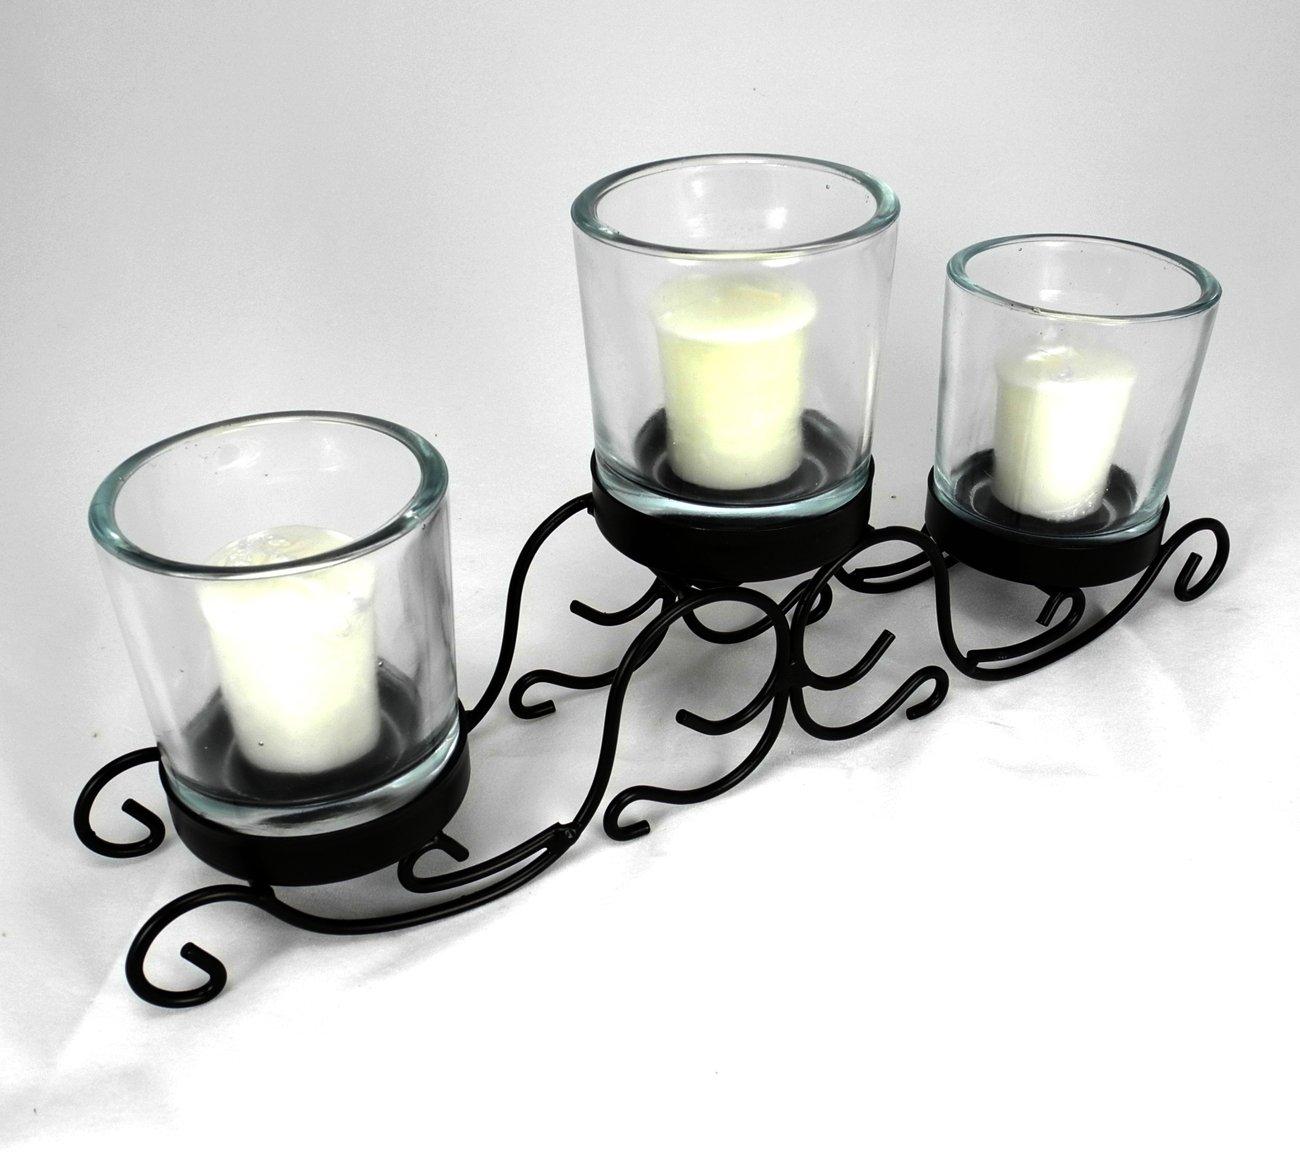 Cheap Iron Candle Holder Centerpiece Find Iron Candle Holder Centerpiece Deals On Line At Alibaba Com